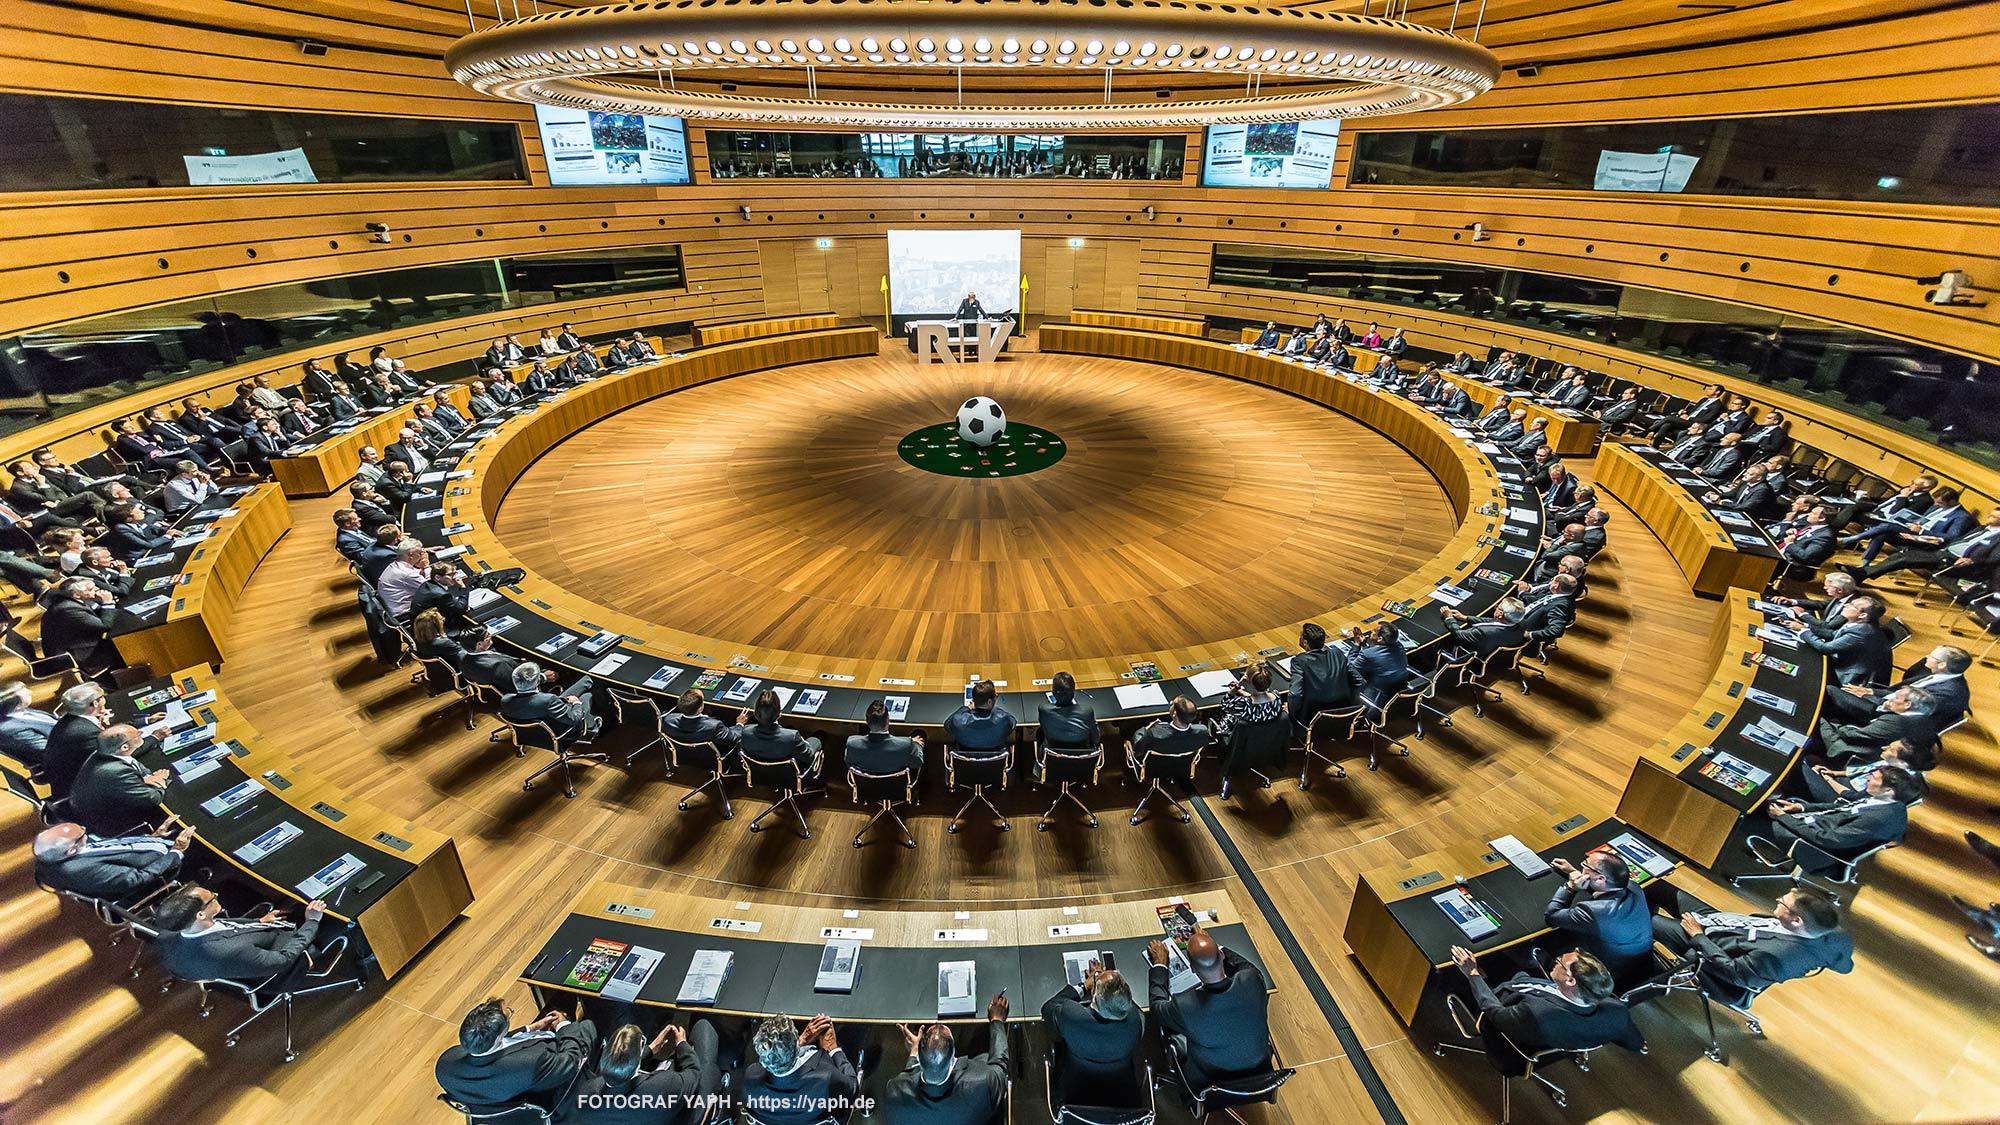 Luxembourg Congres Center - Eventfotograf Trier Yaph